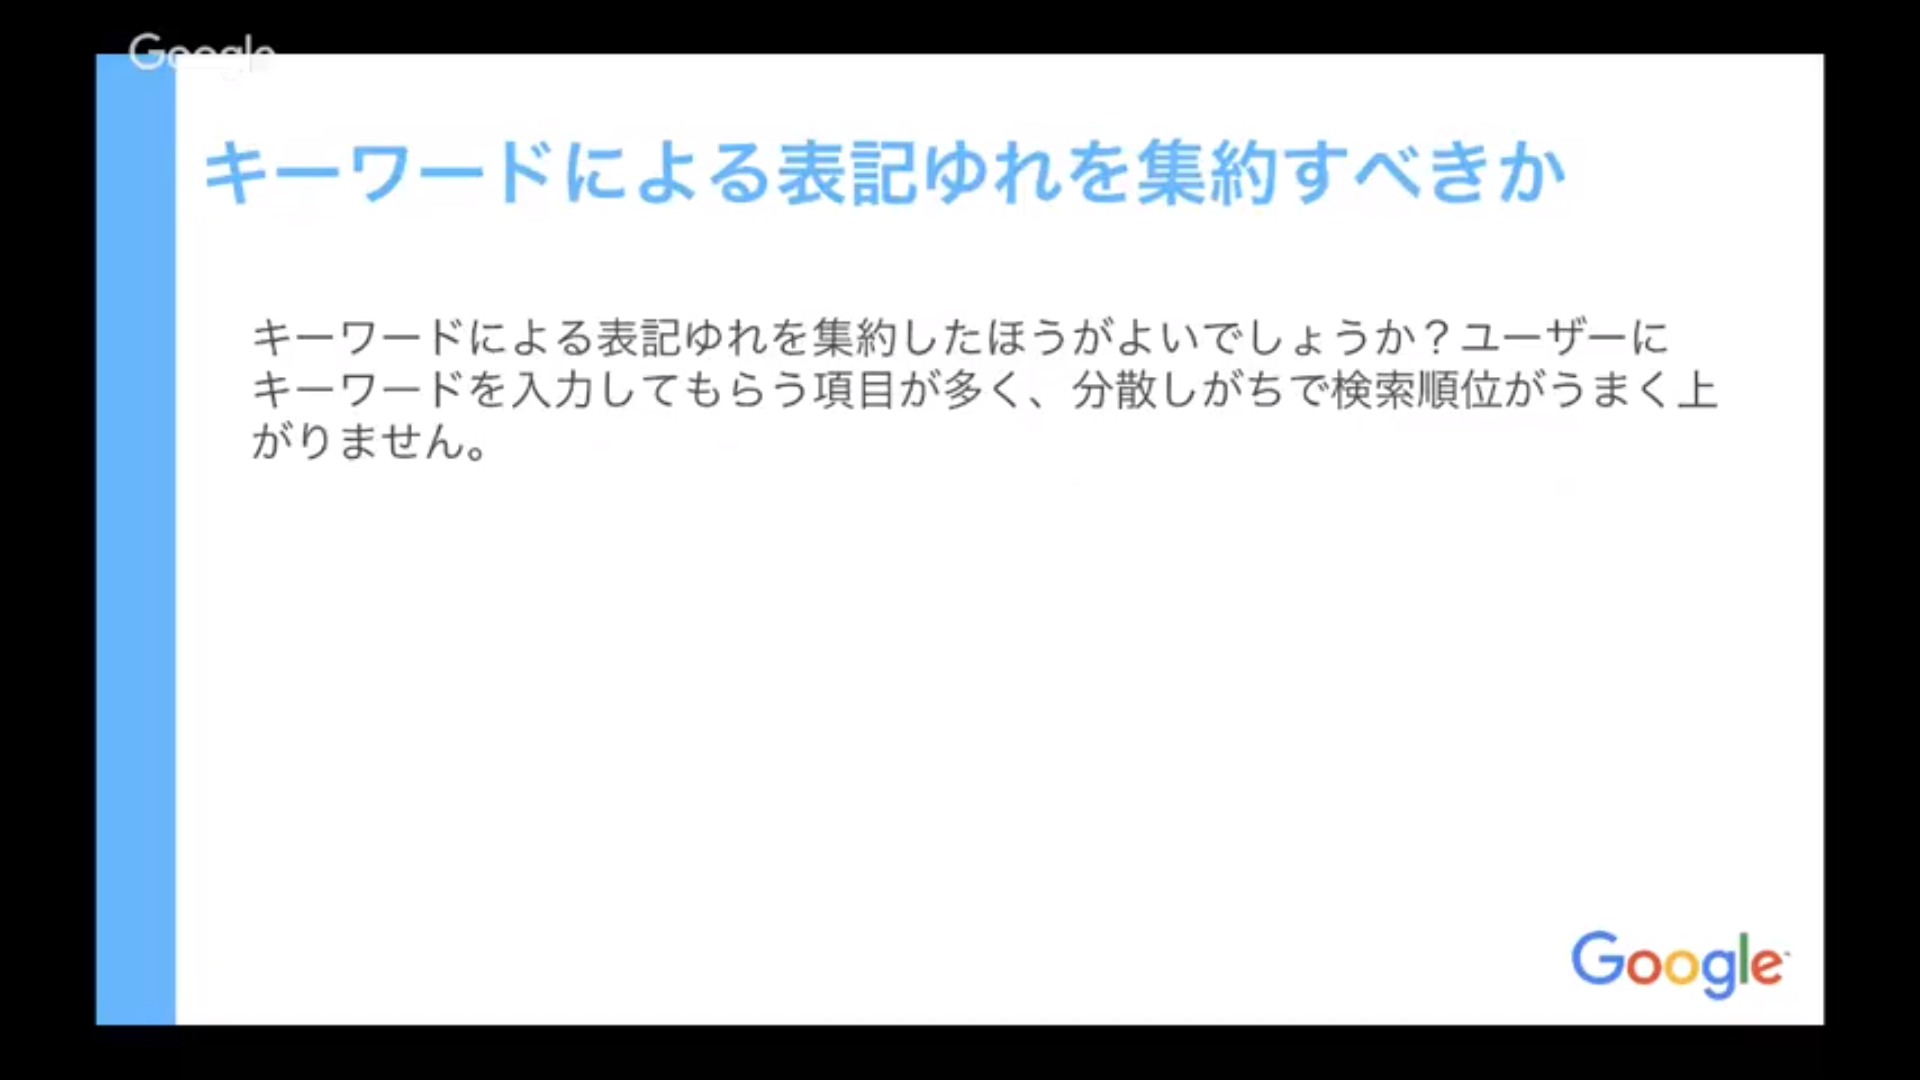 SnapCrab_NoName_2019-3-7_12-25-21_No-00